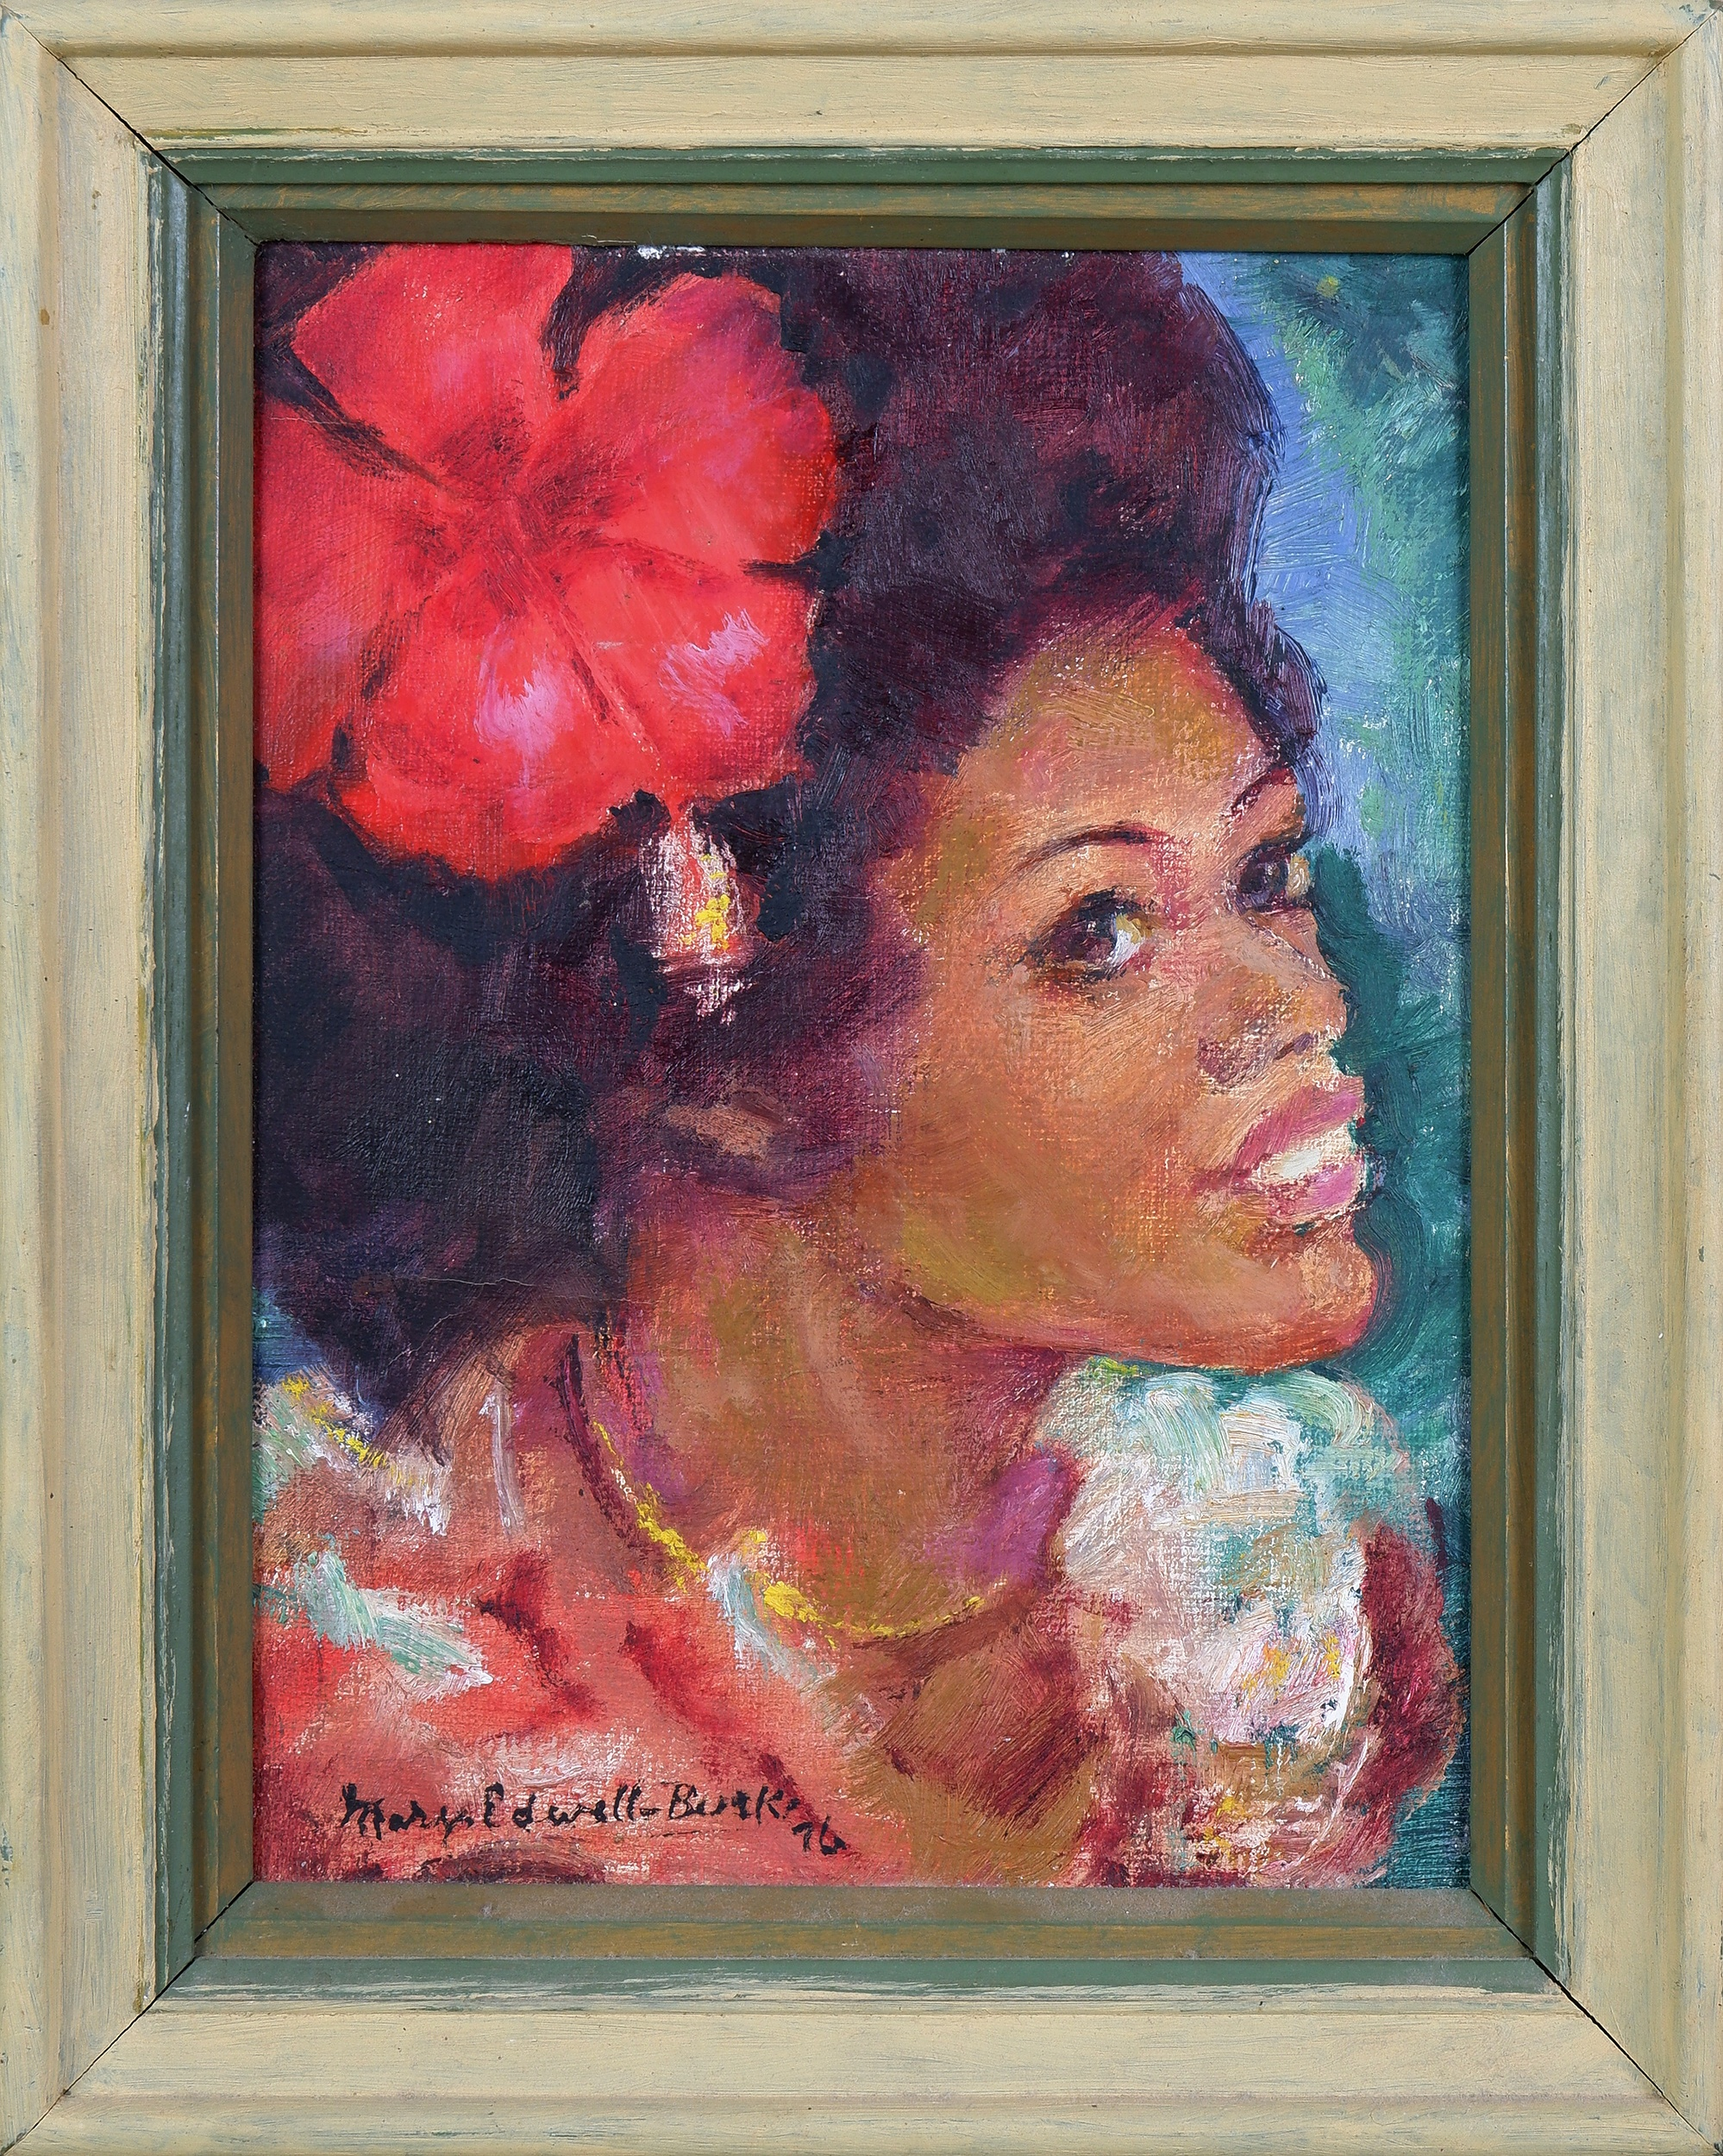 'Mary Edwell-Burke (1894-1988), Untitled (Fijian Woman) 1976, Oil on Canvas on Board, 19 x 14 cm'